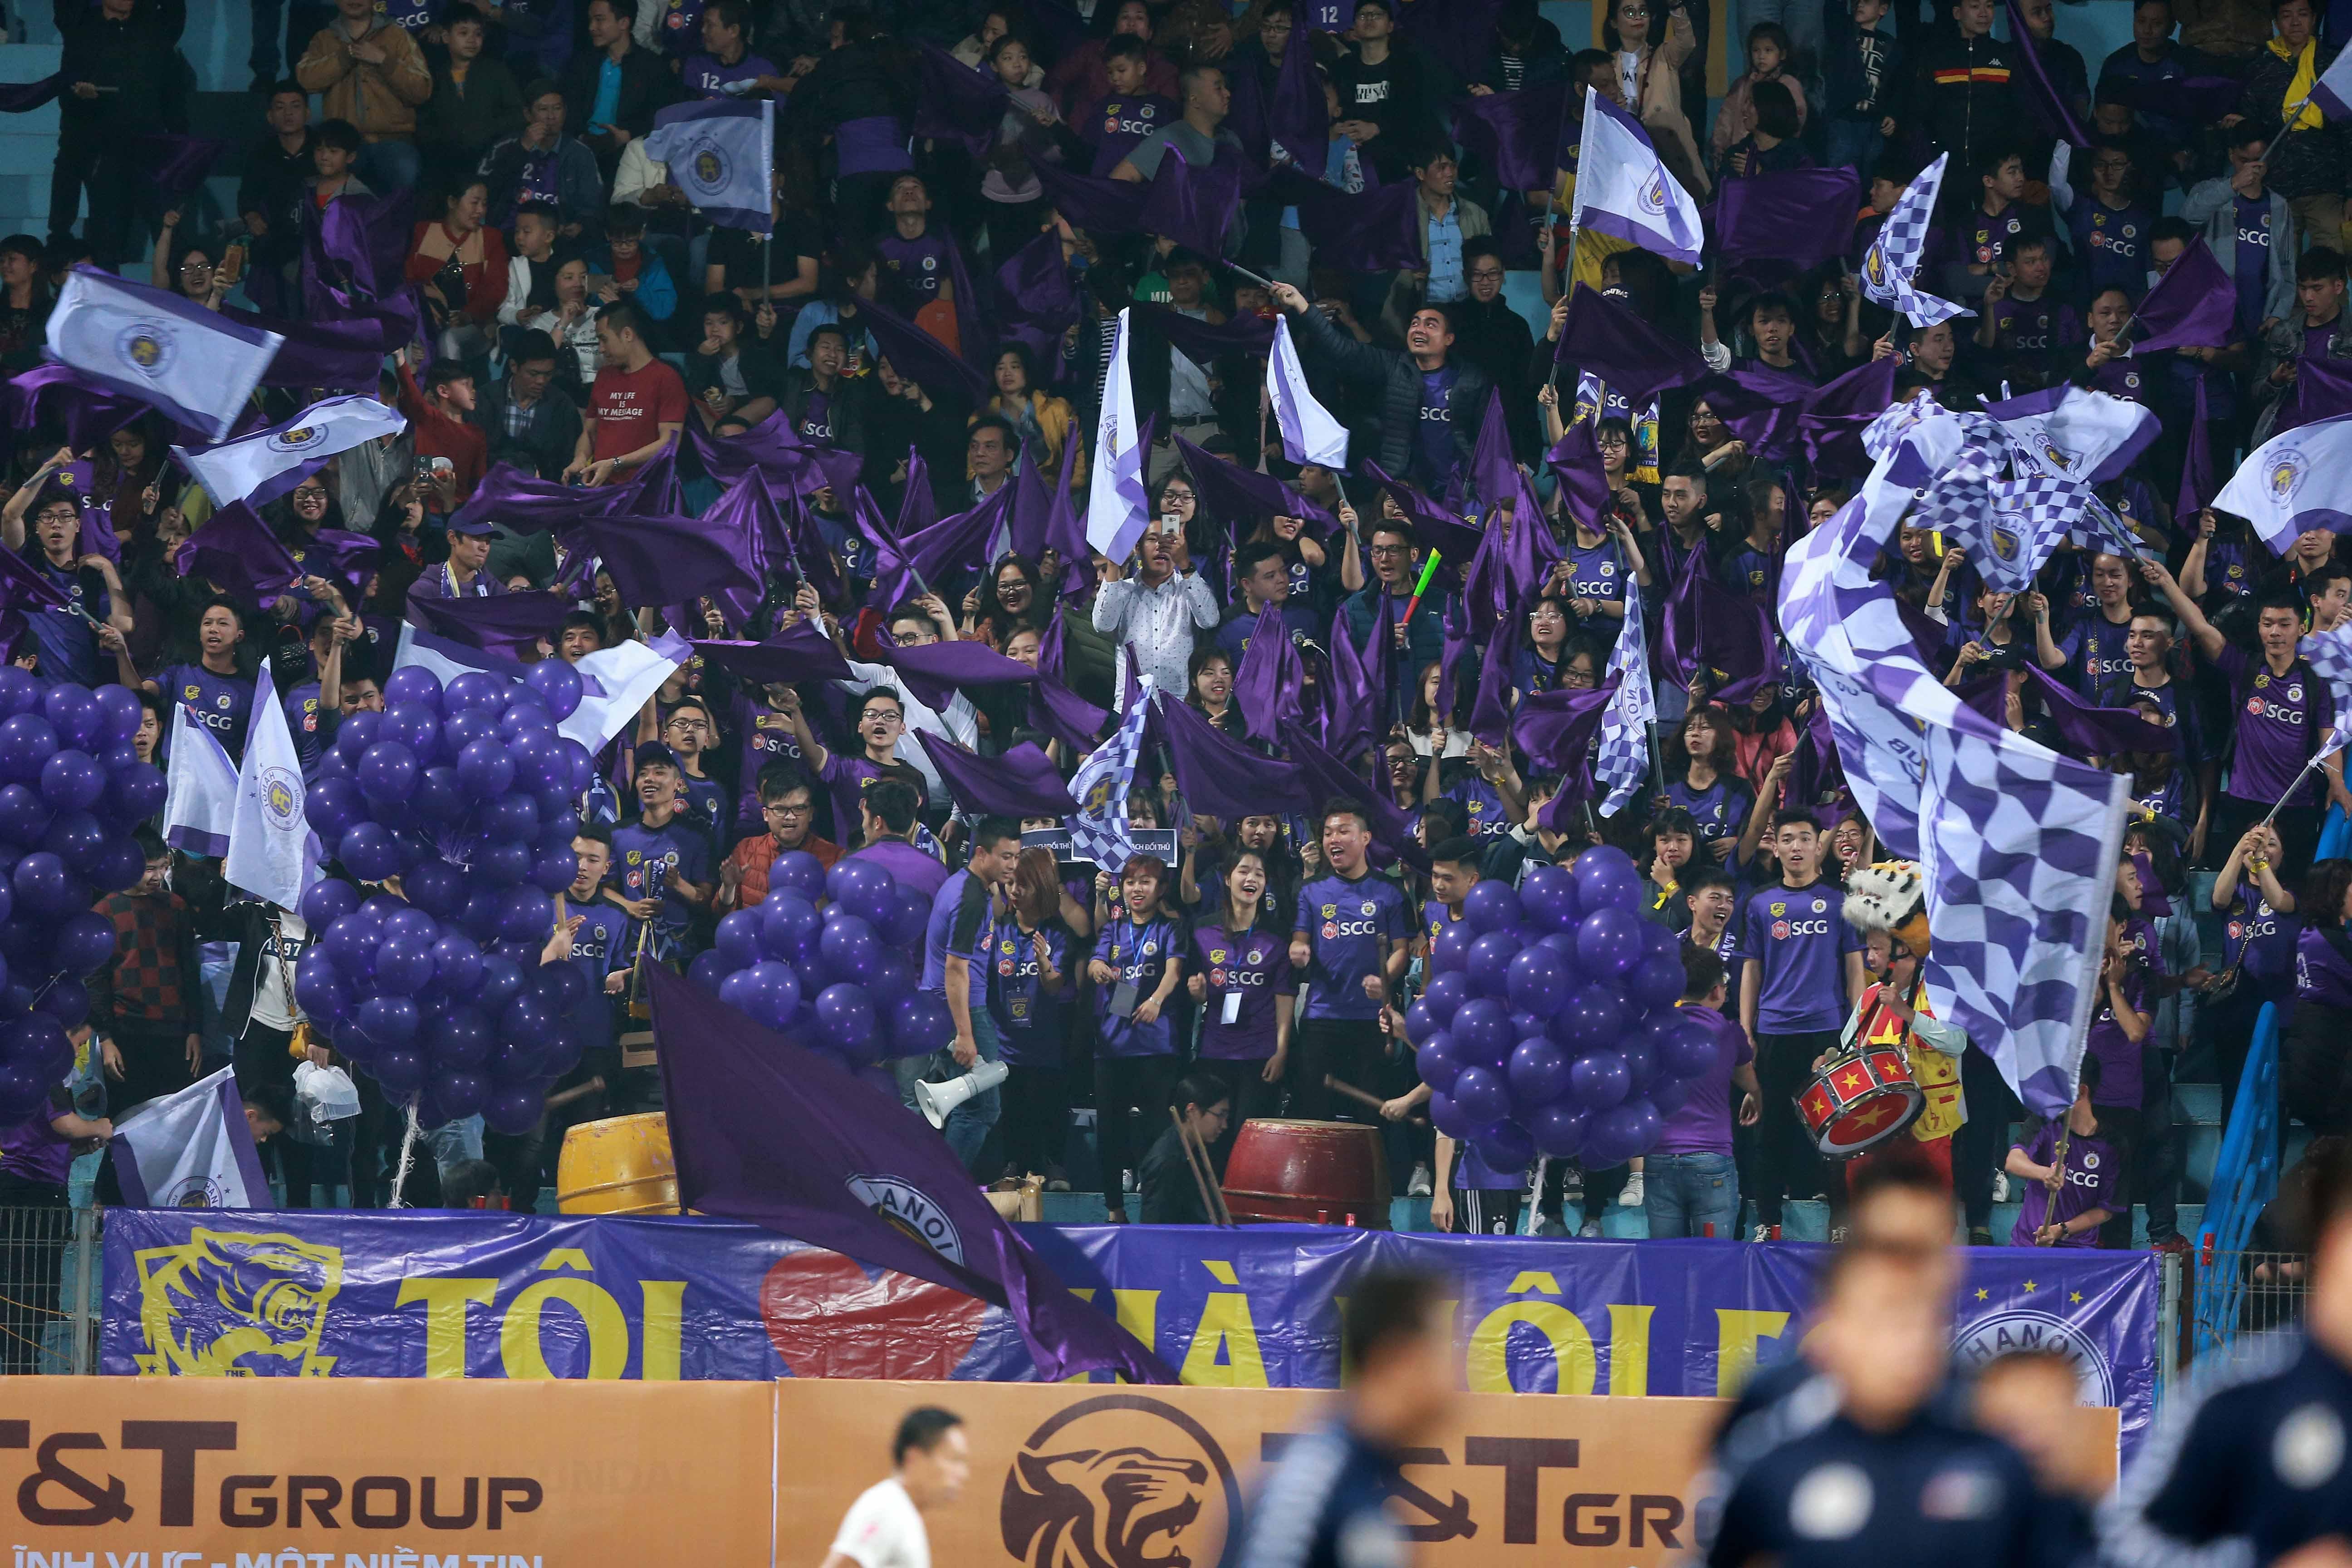 Vietnam's top-tier football league kicks off 2018 season with record audience